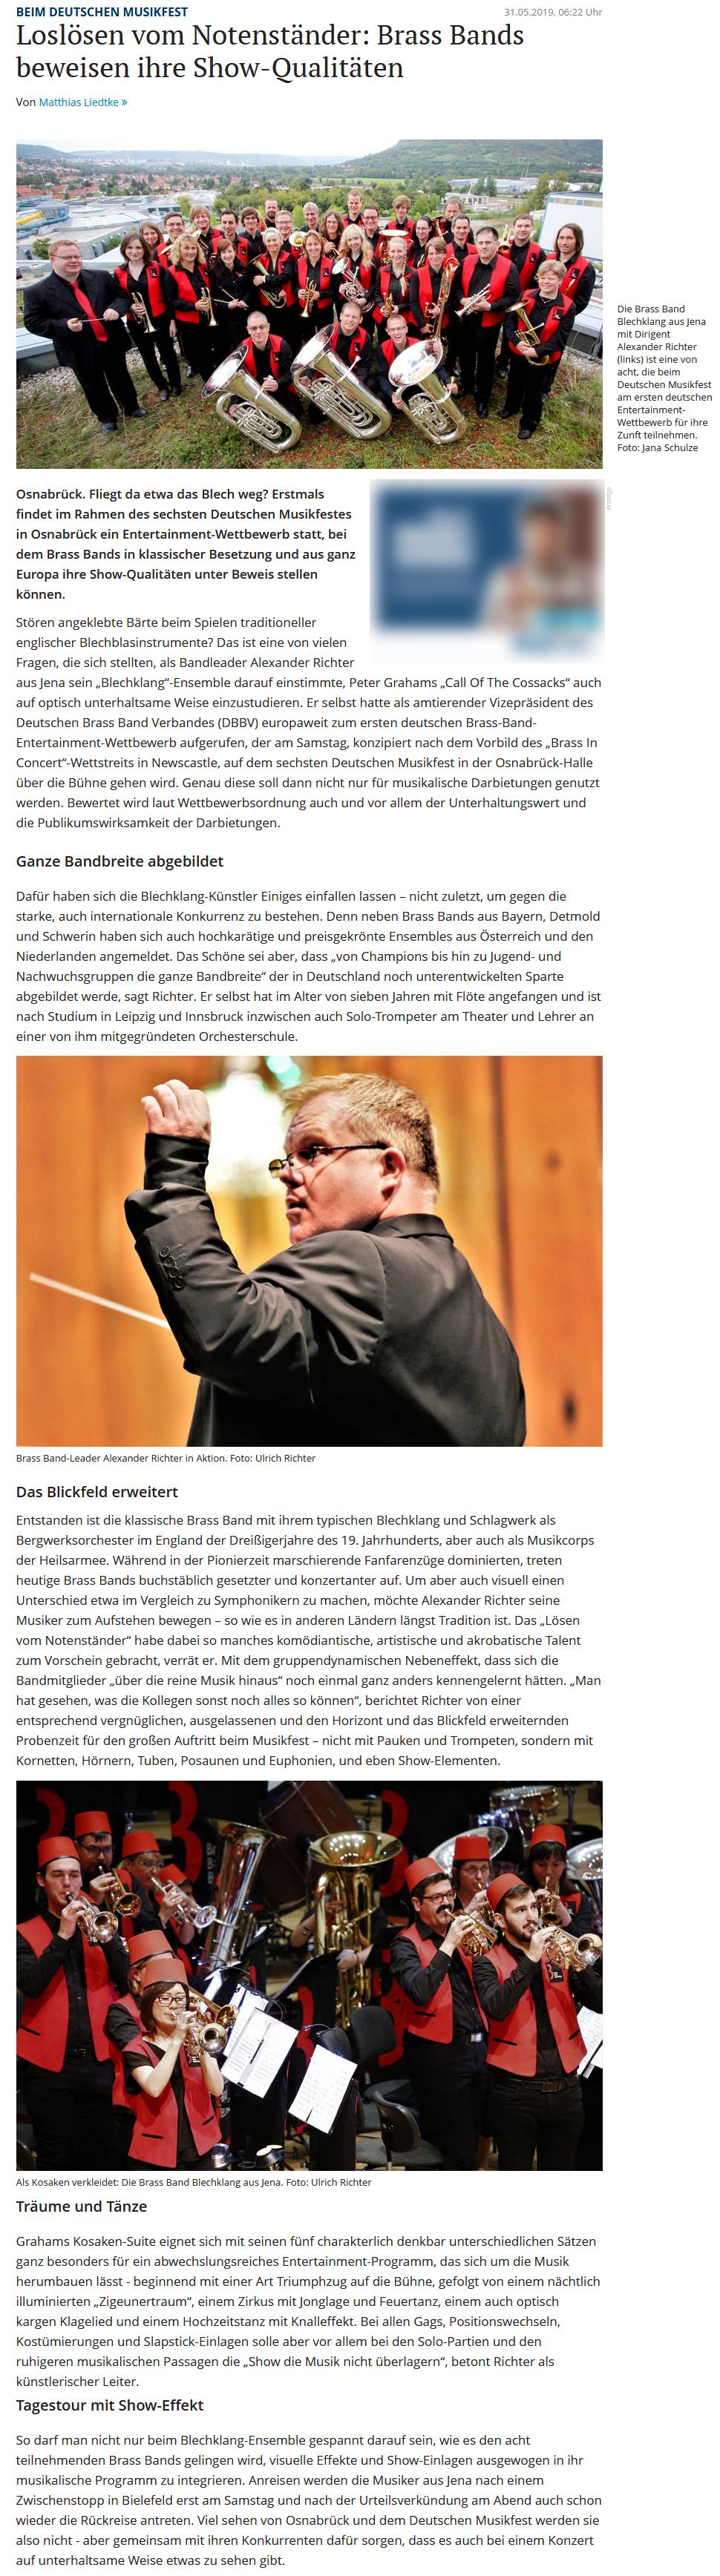 Artikel NOZ über die Teilnahme der Brass Band BlechKLANG am Brass Band Entertainment Wettbewerb in Osnabrück